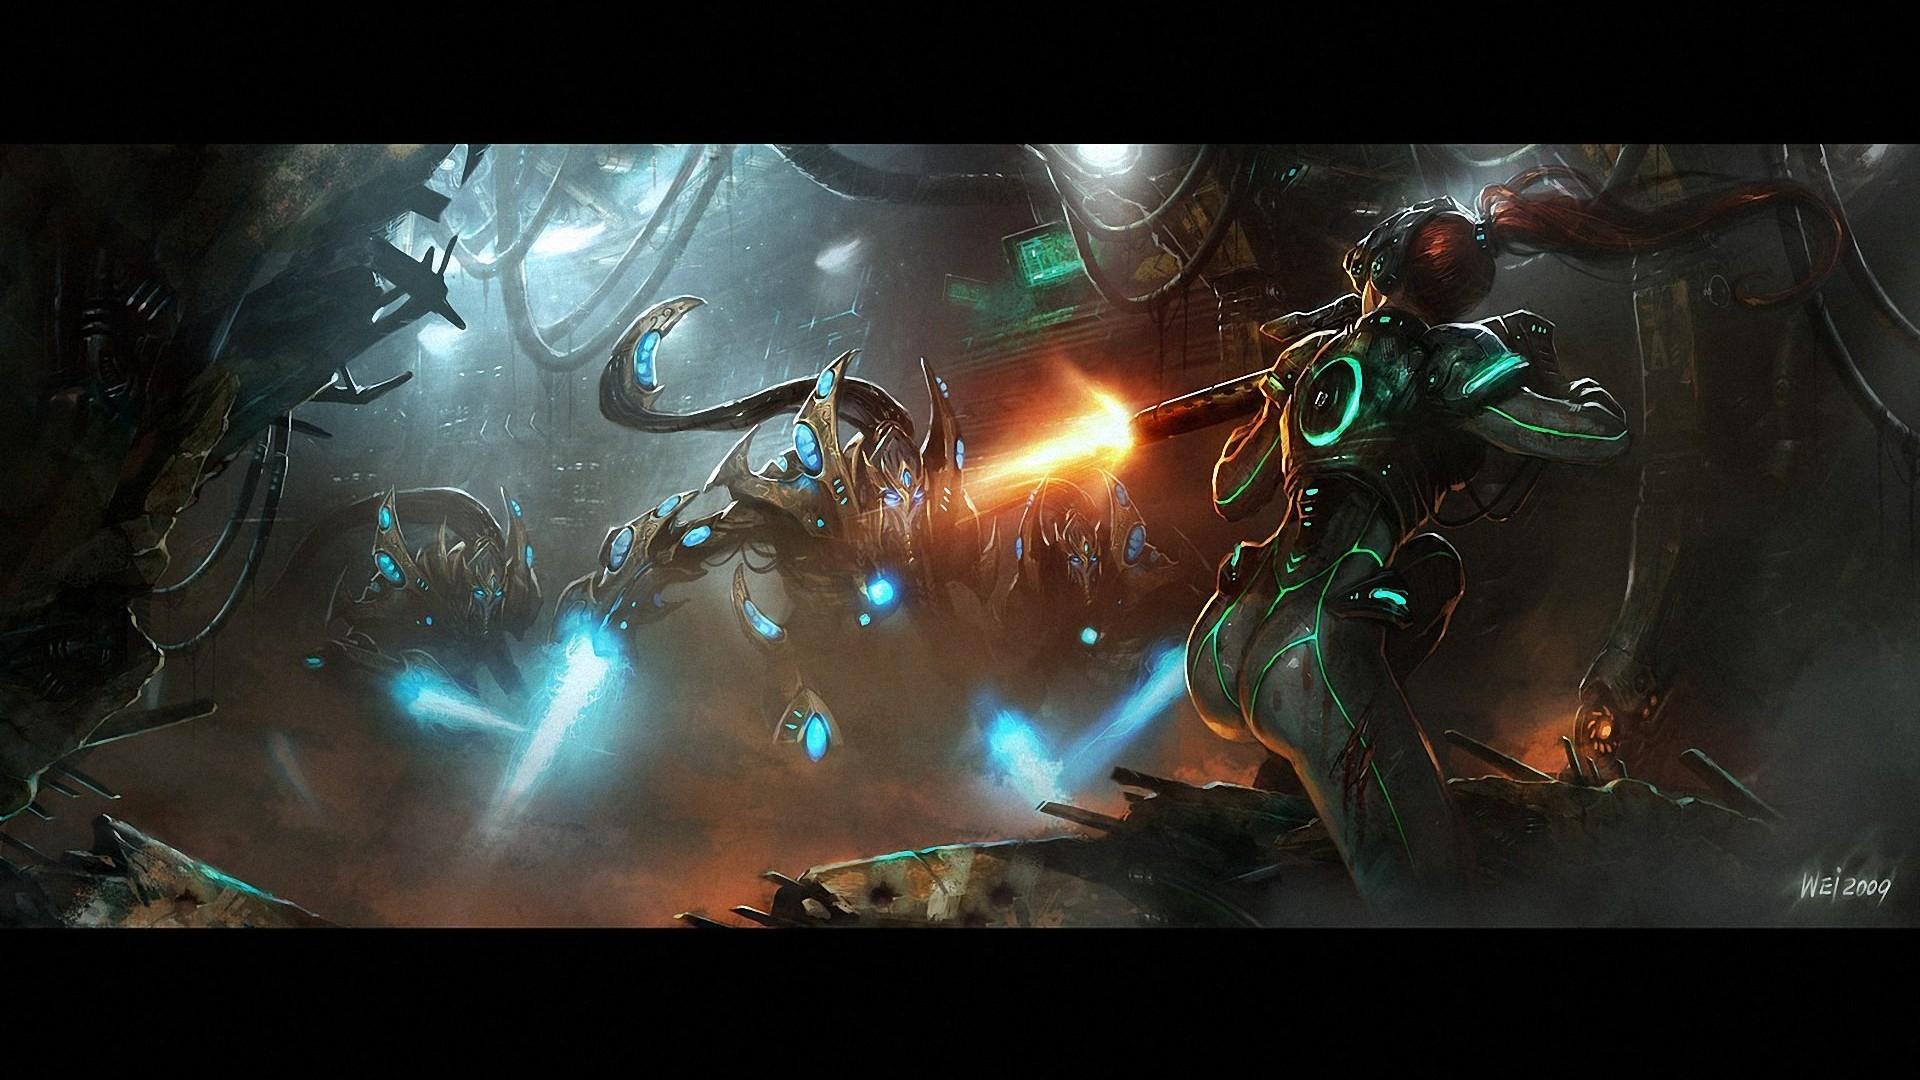 starcraft protoss high templar wallpaper | Starcraft 2 Kerrigan Wallpaper  1080p #1